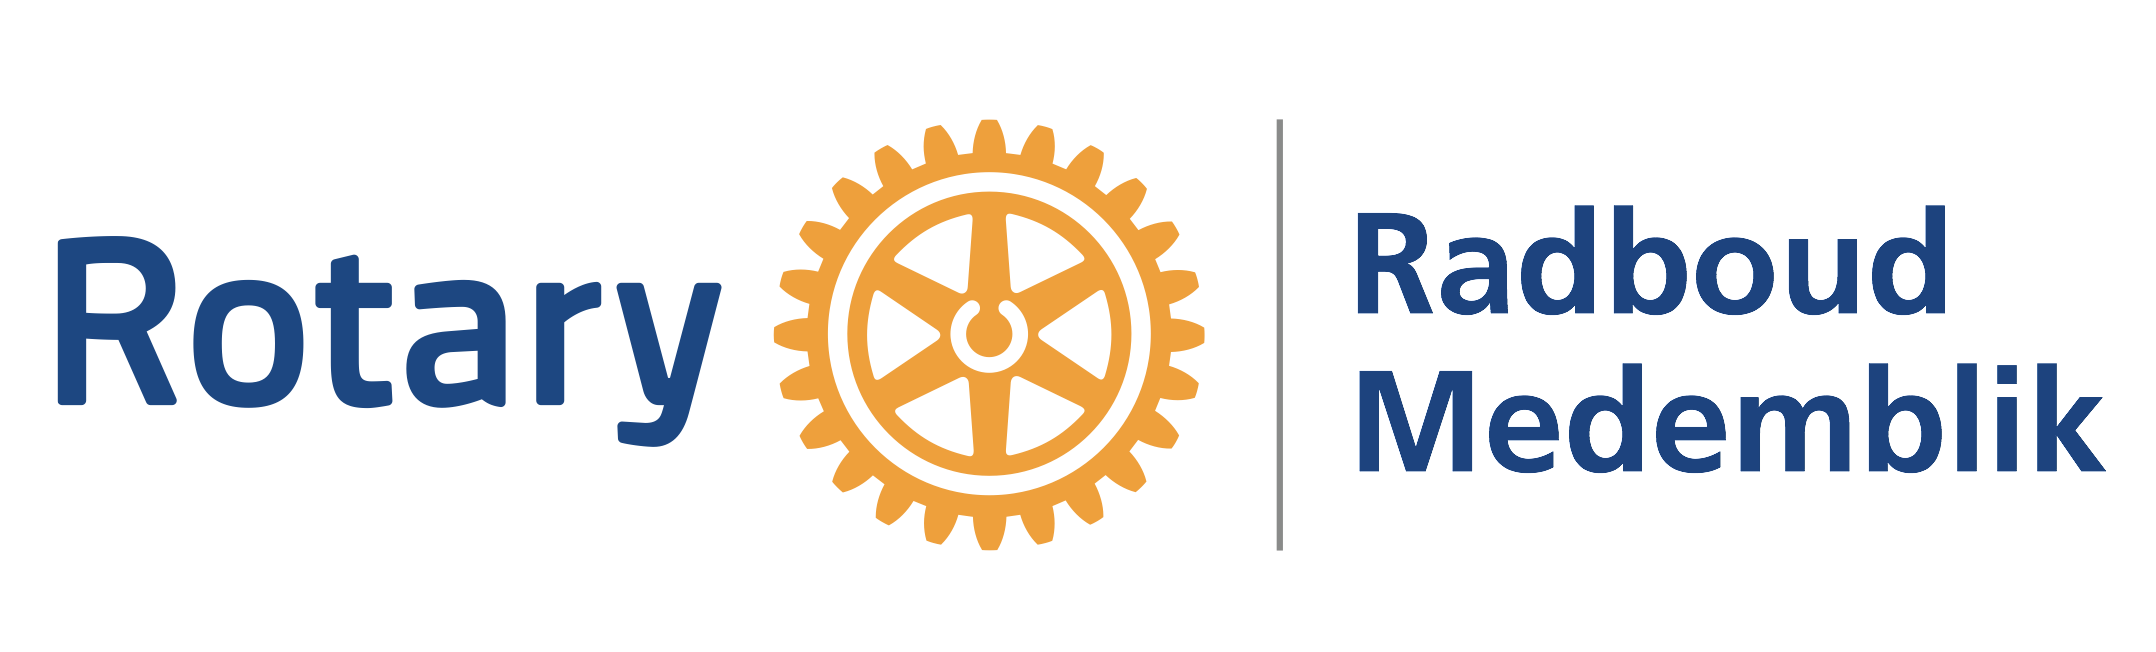 Rotaryclub Radboud Medemblik